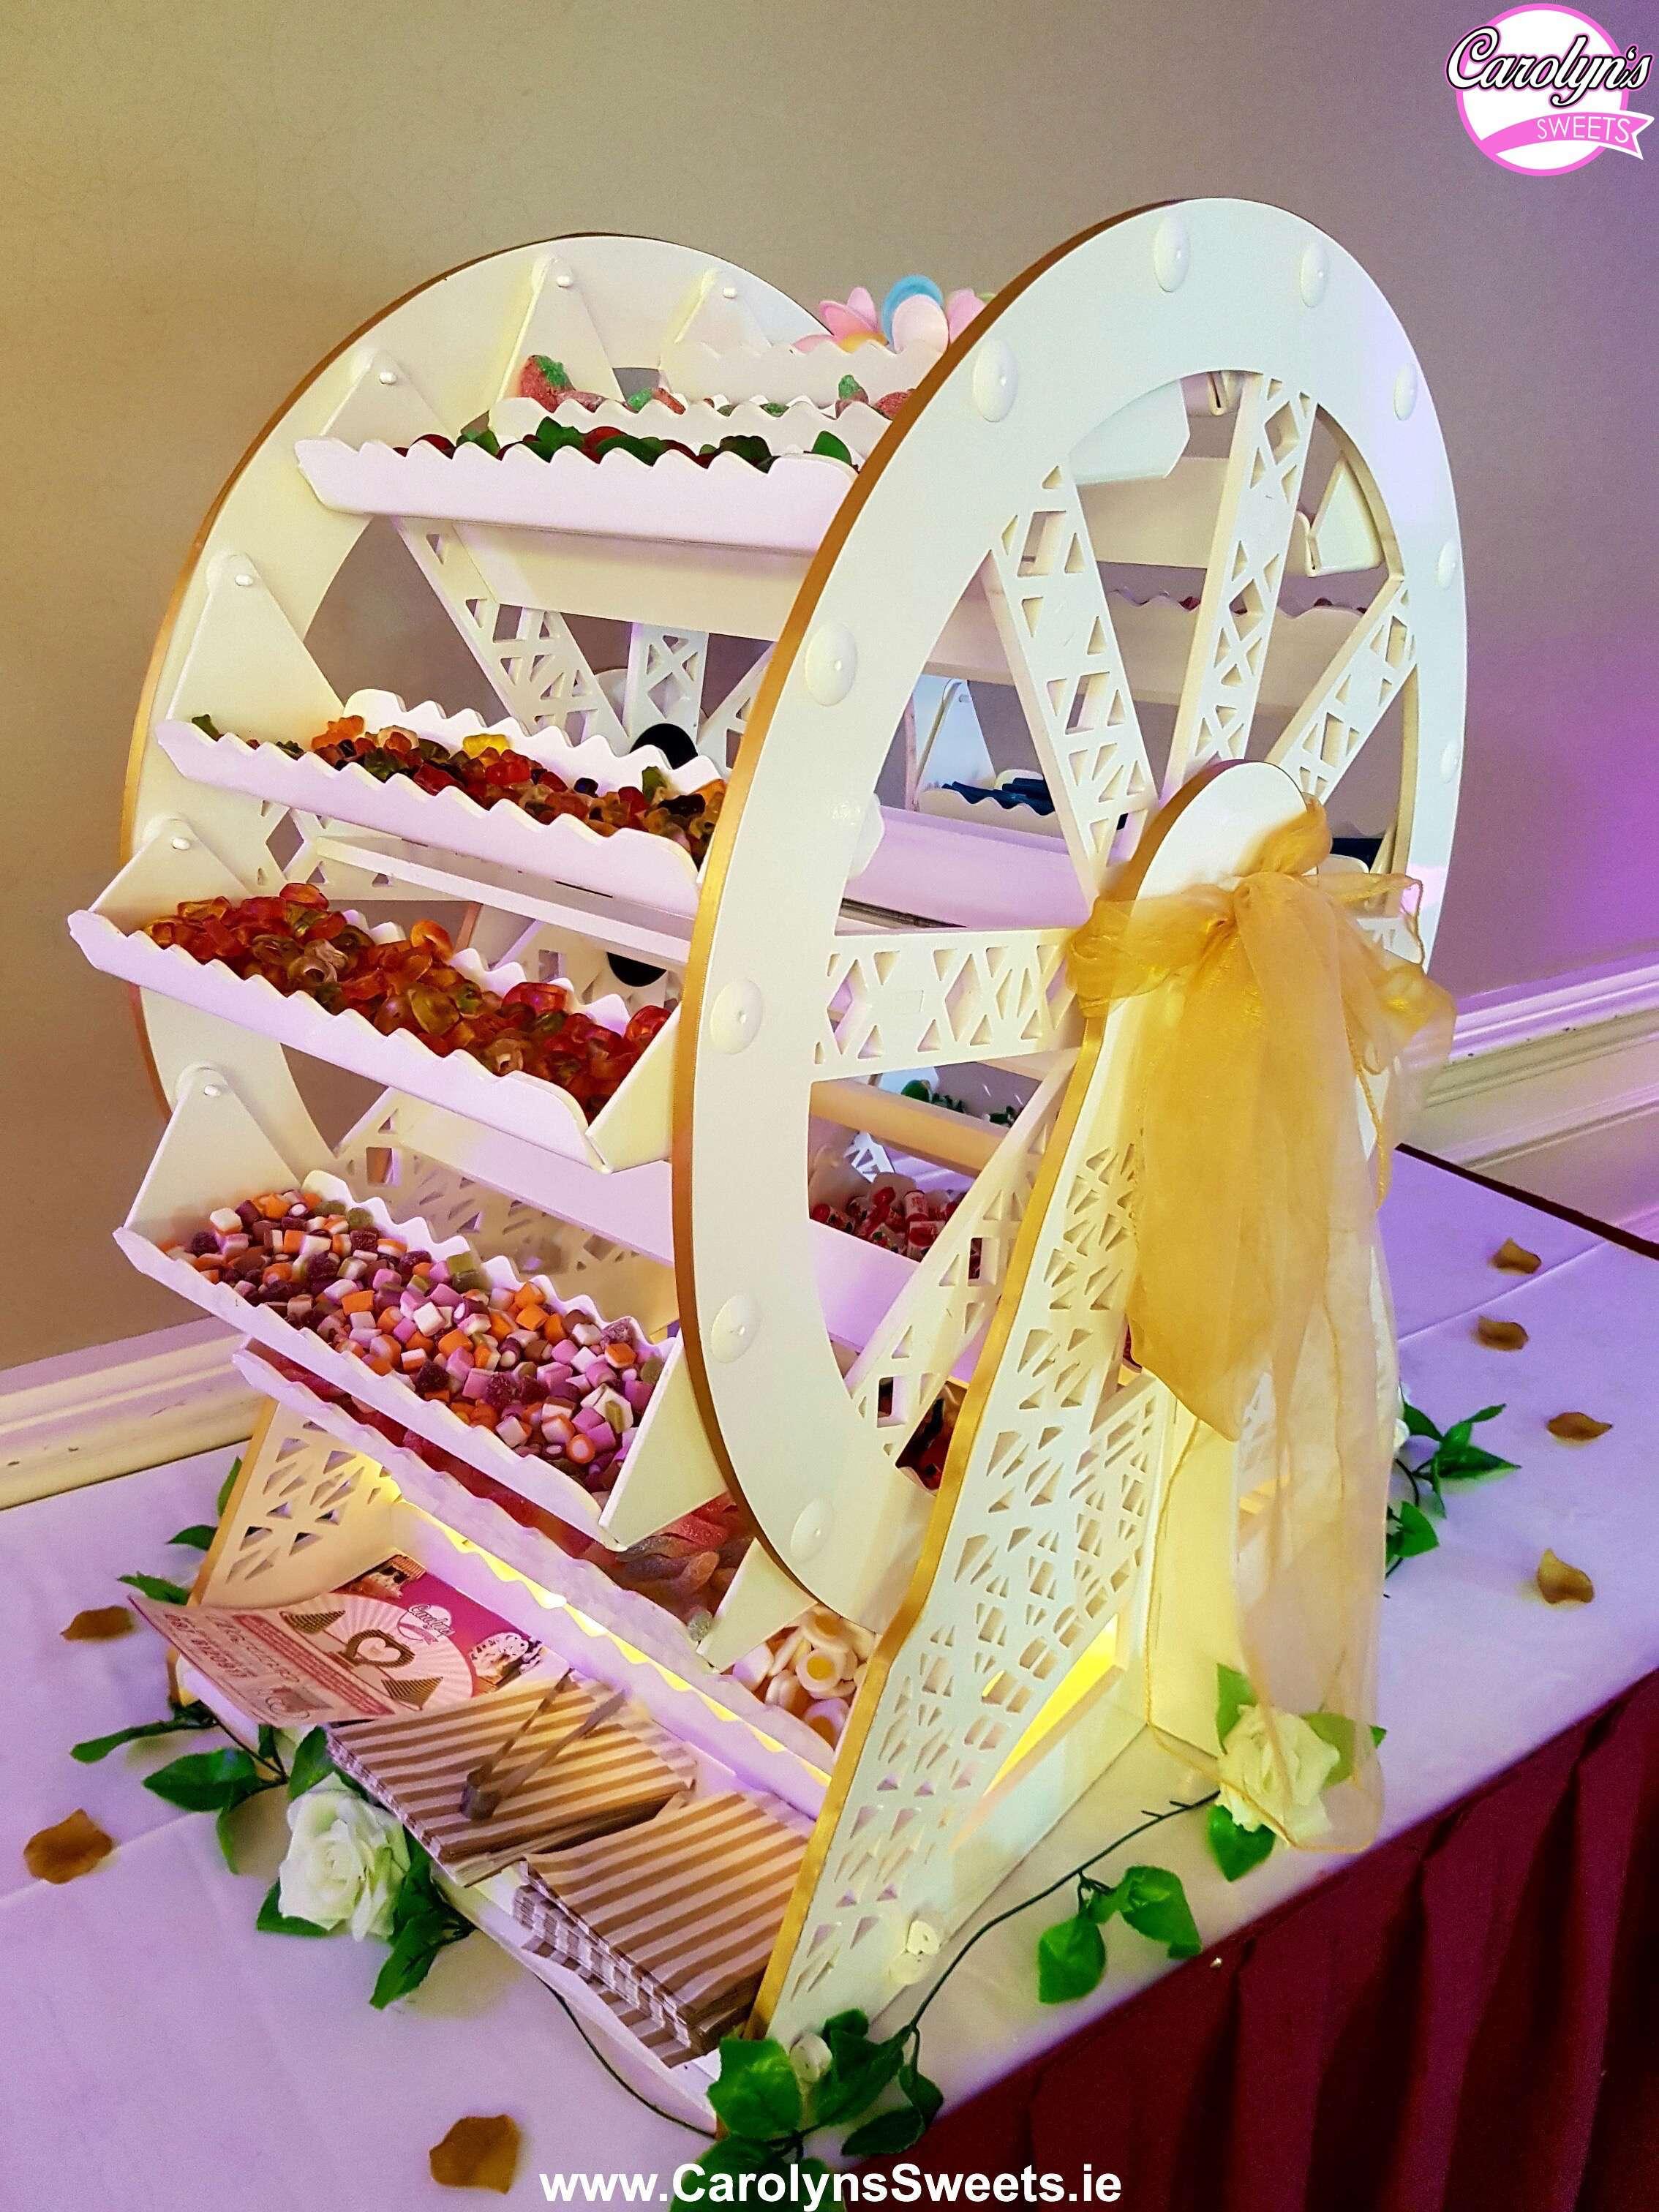 Candy Ferris Wheel Hire3 2